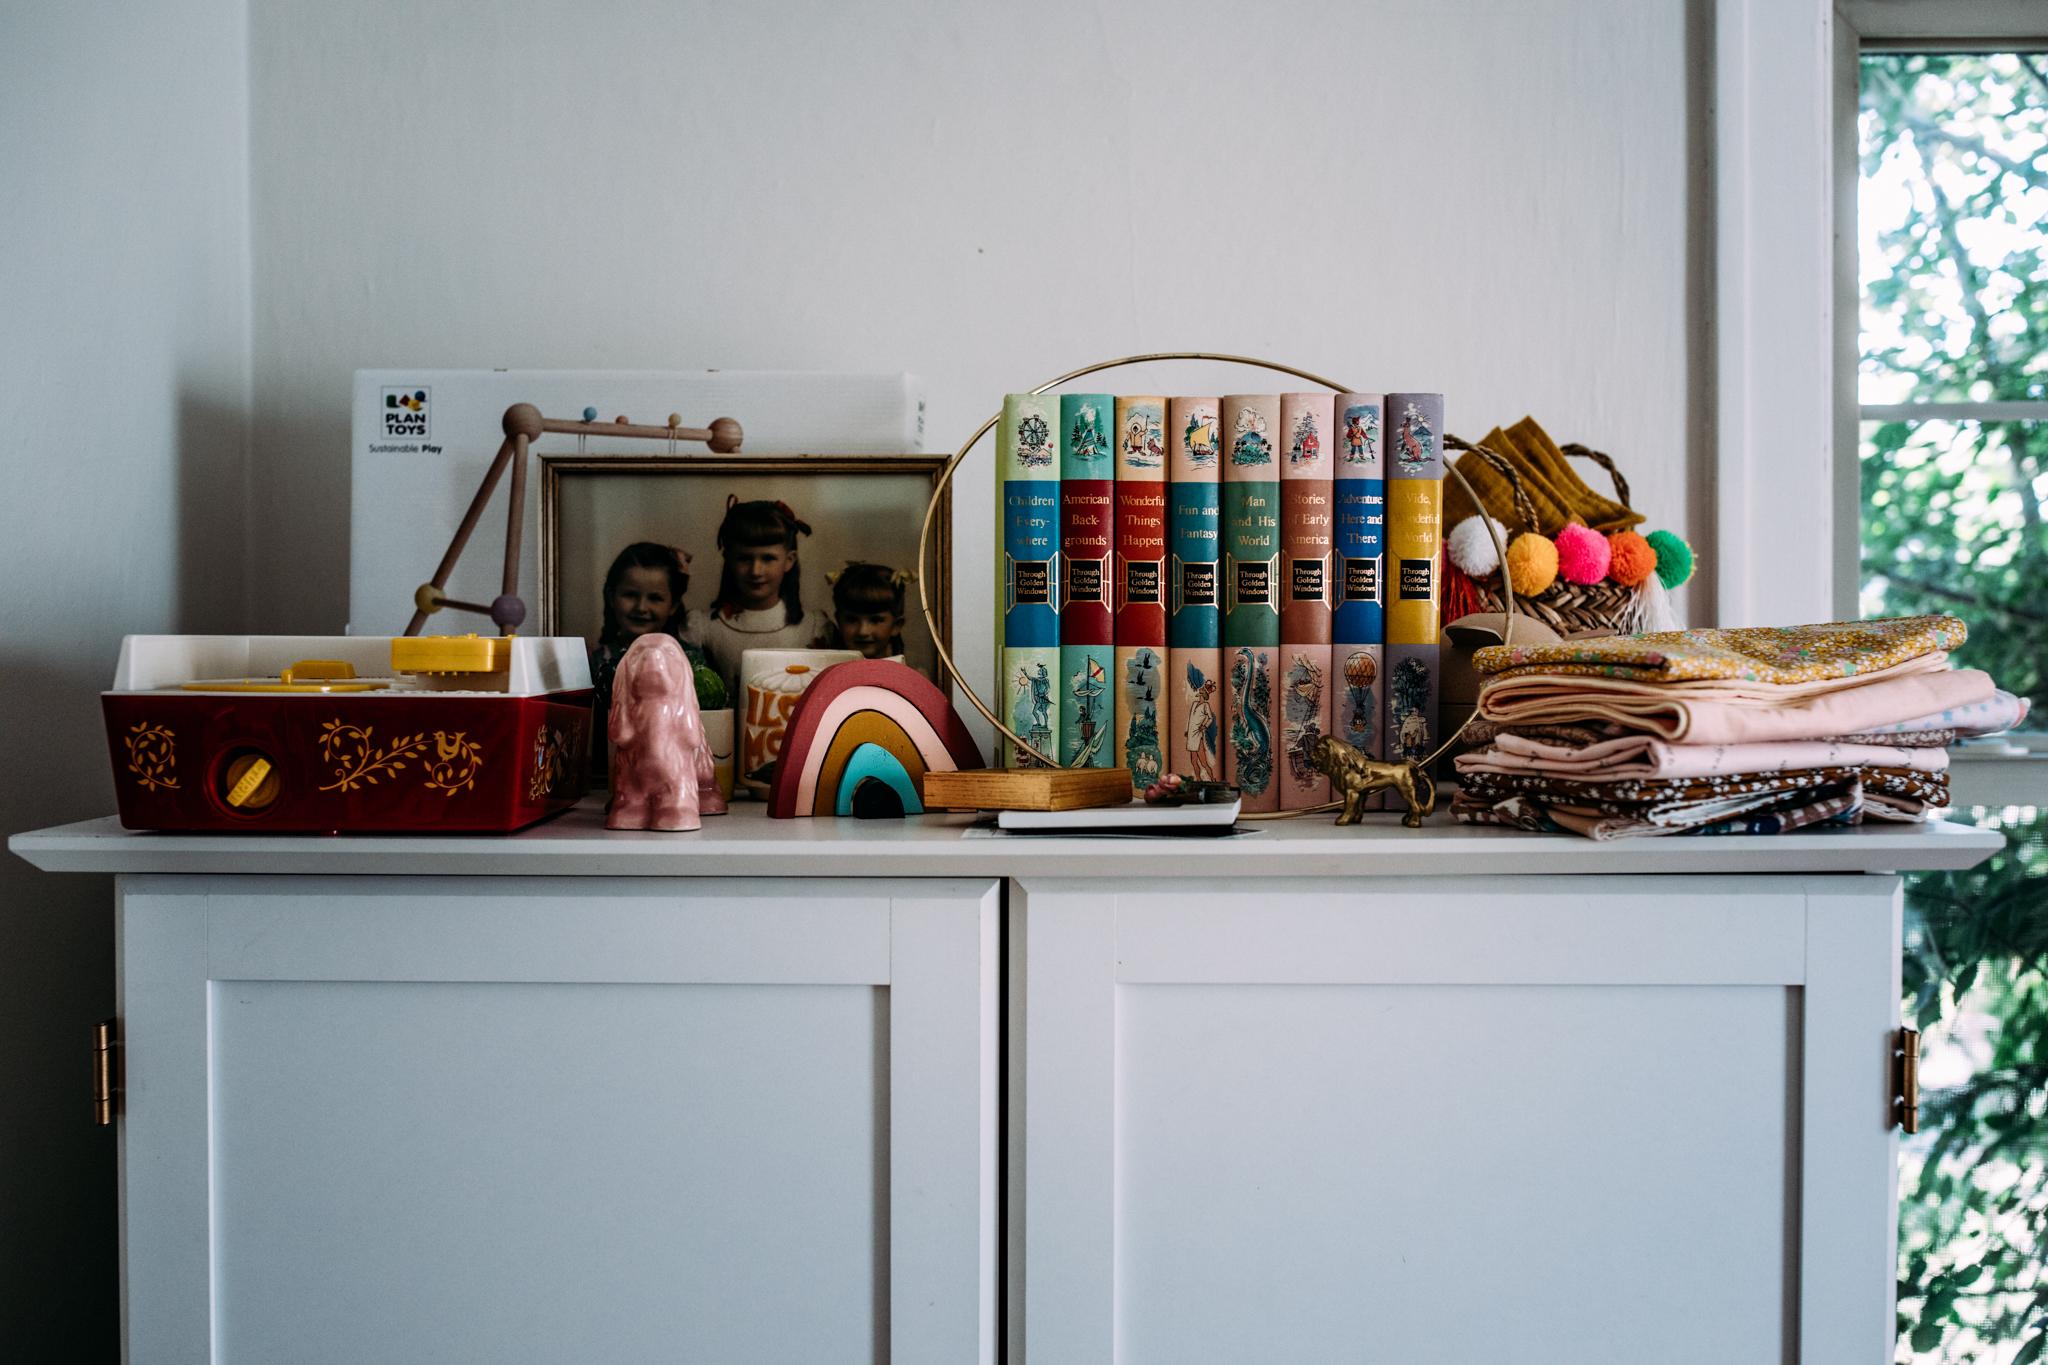 spokane maternity portraits by seattle family photographer anna nodolf